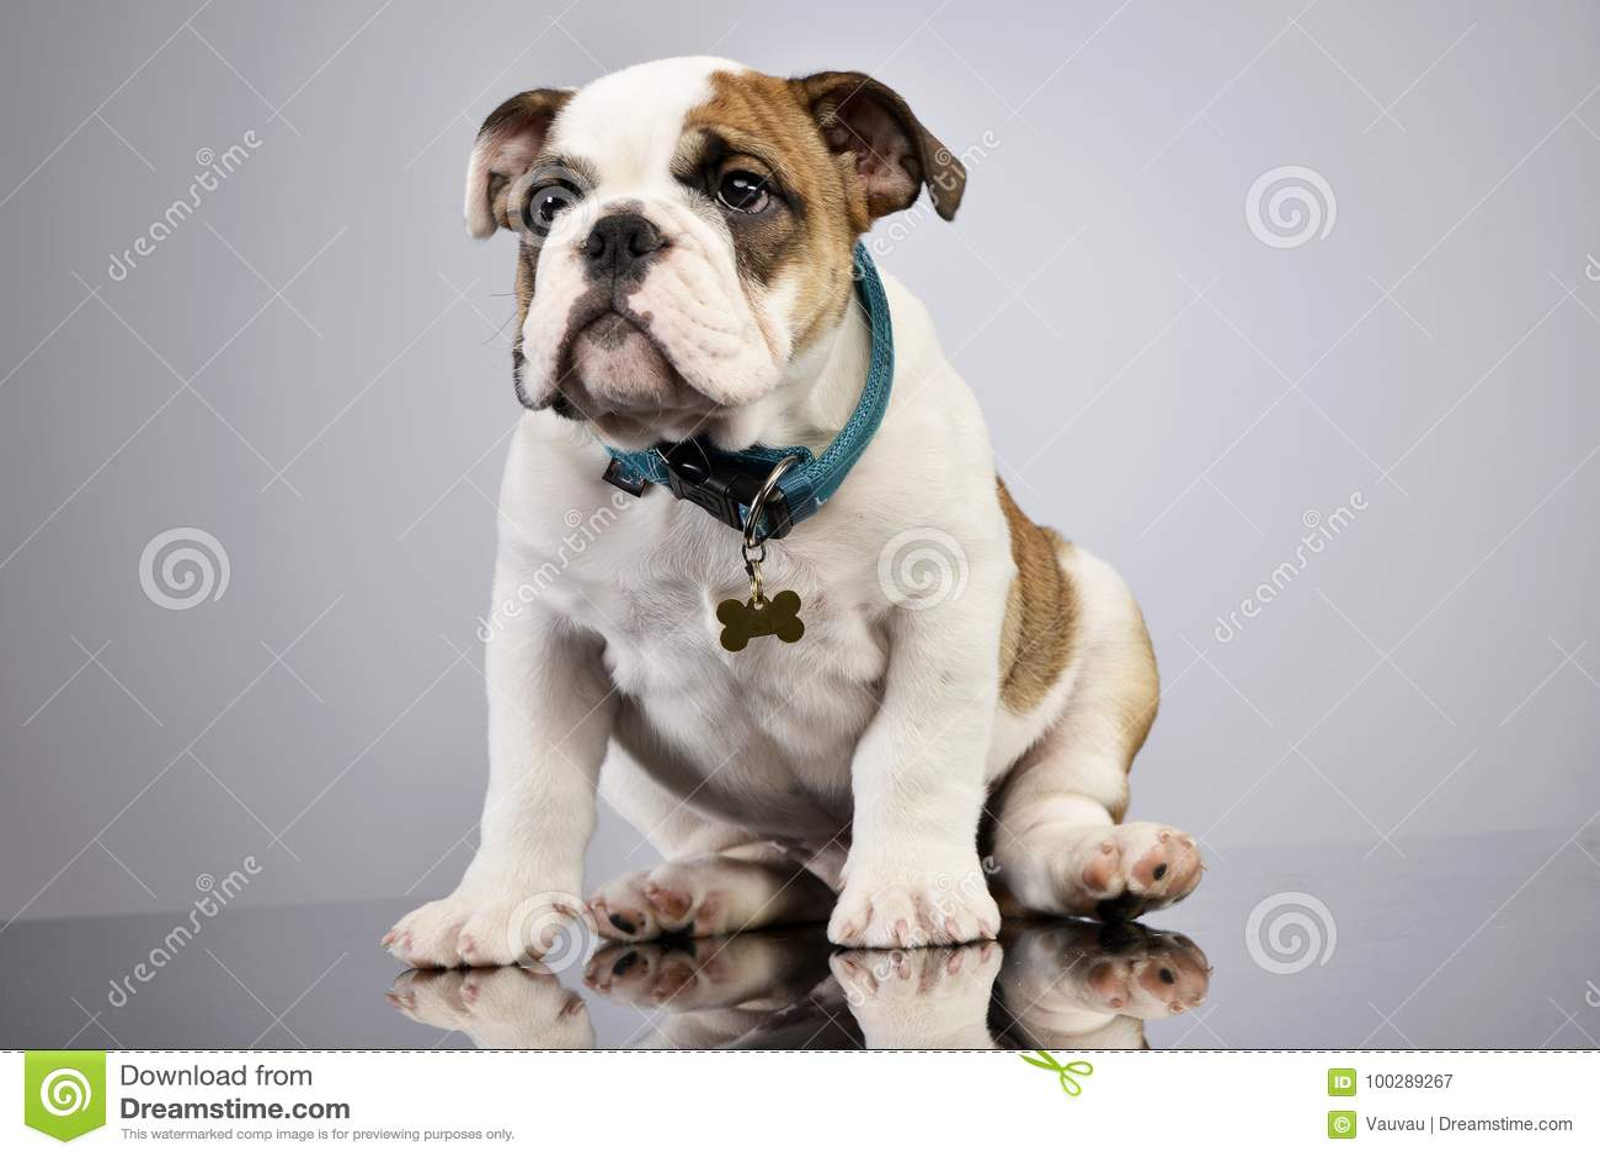 Studio Shot Of An Adorable English Bulldog Puppy Stock Image Image Of Coat Domestic 100289267